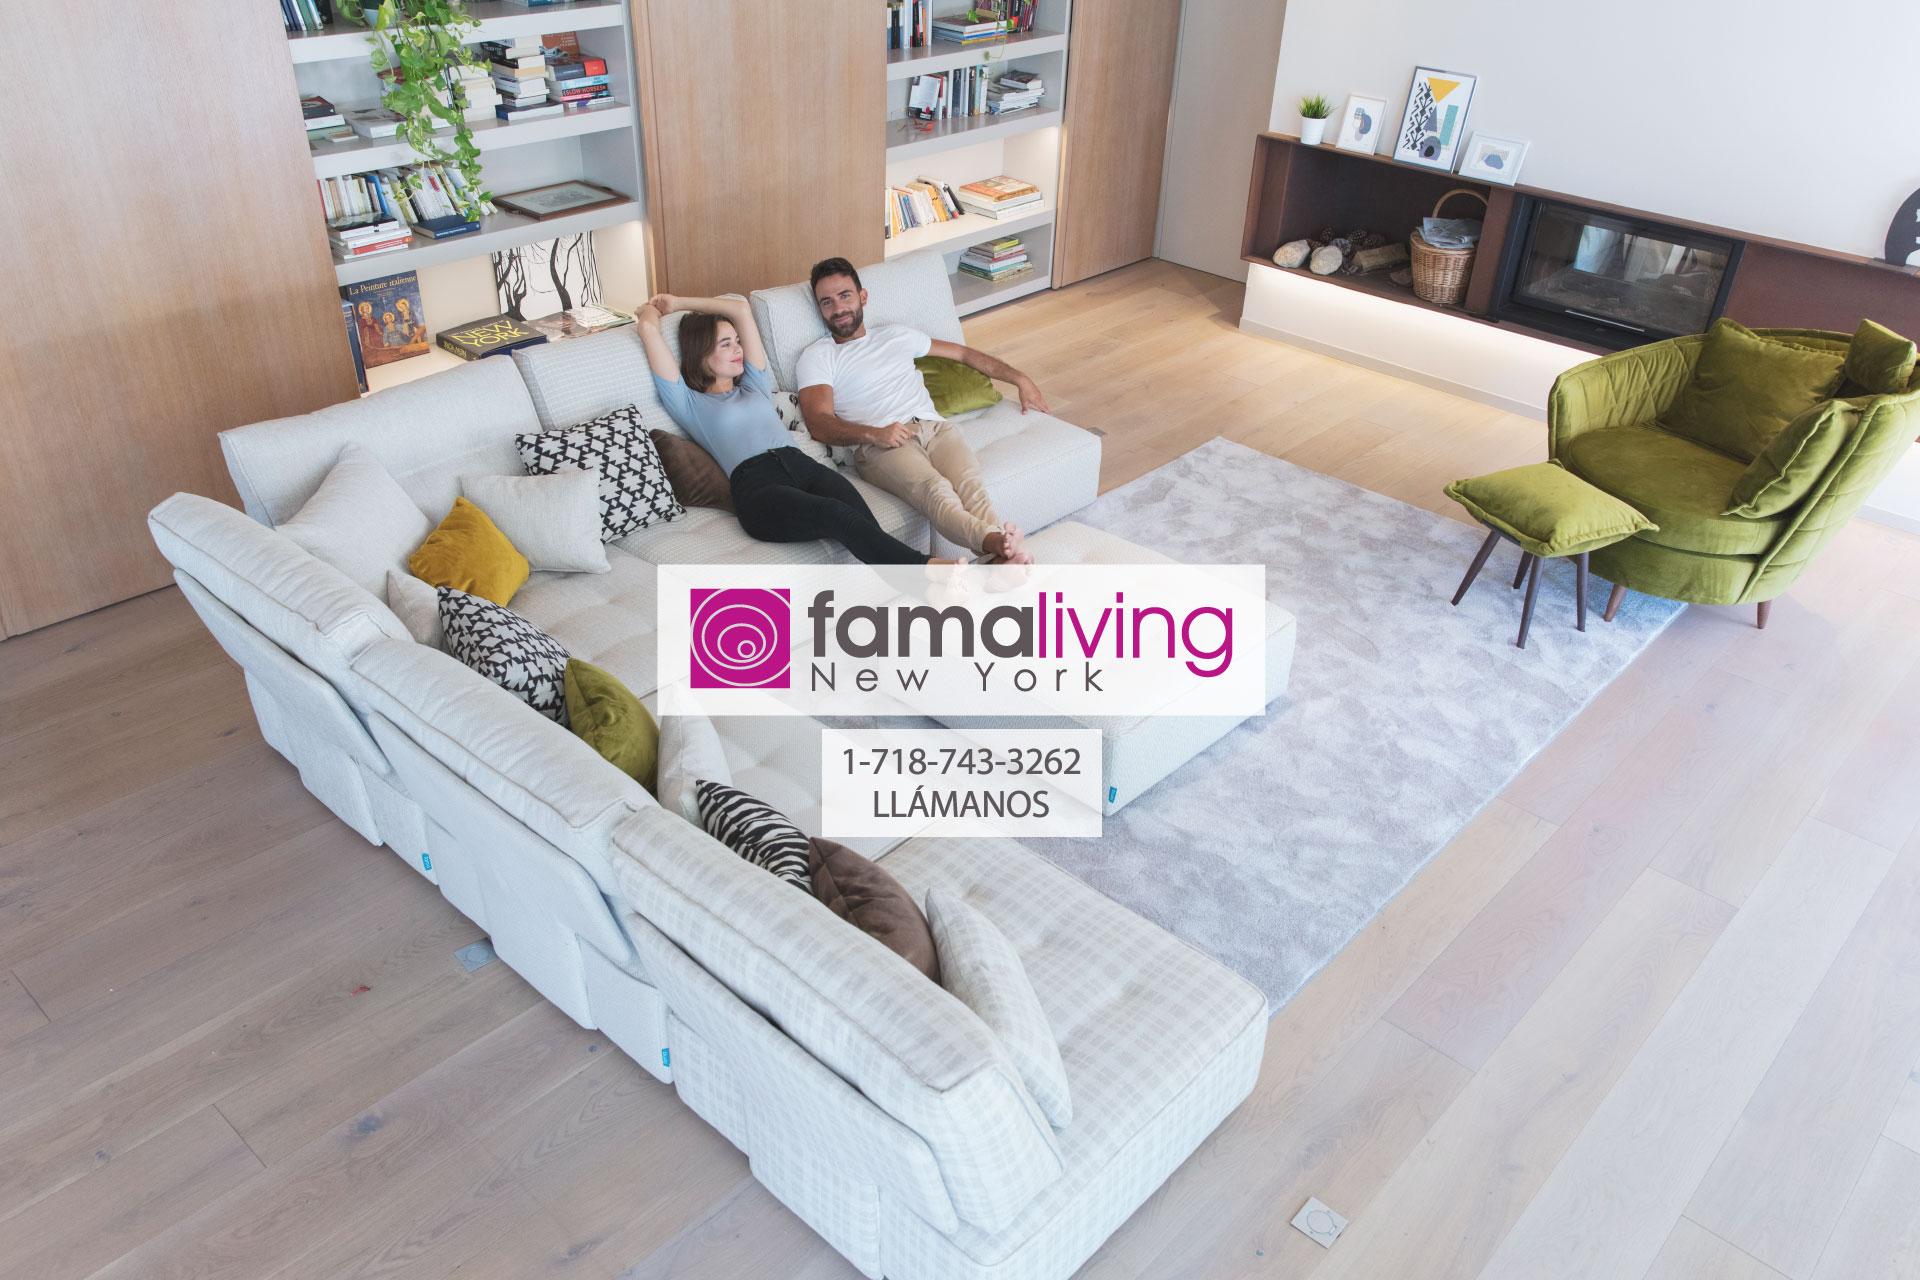 Famaliving New York - Tienda de sofás